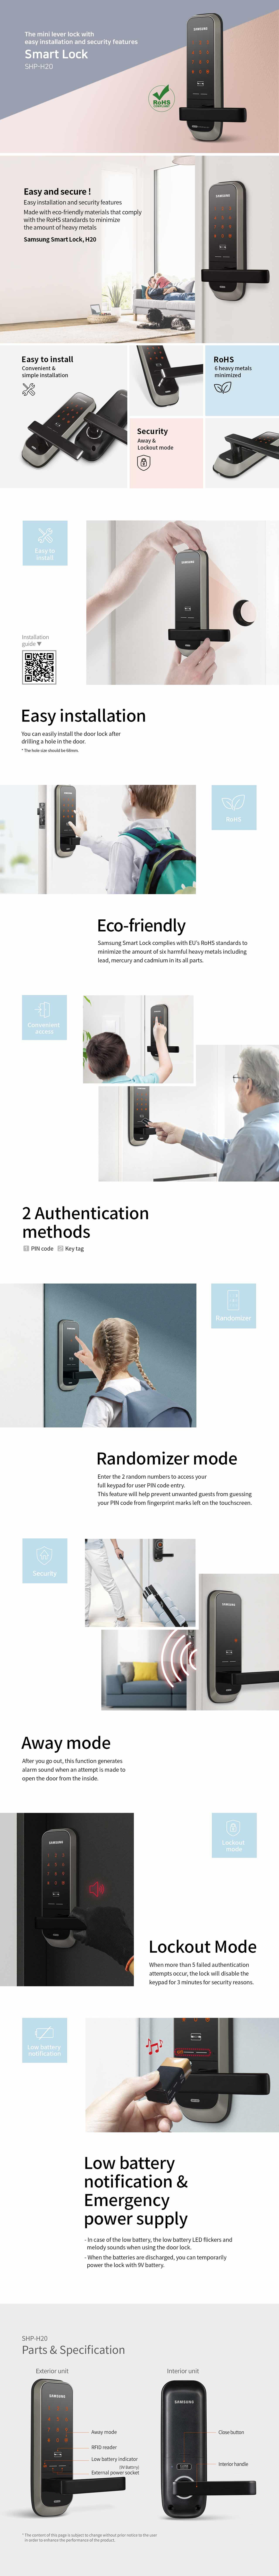 Samsung smart doorlock SHP-H20 กลอนประตู ล็อคระบบดิจิตอล